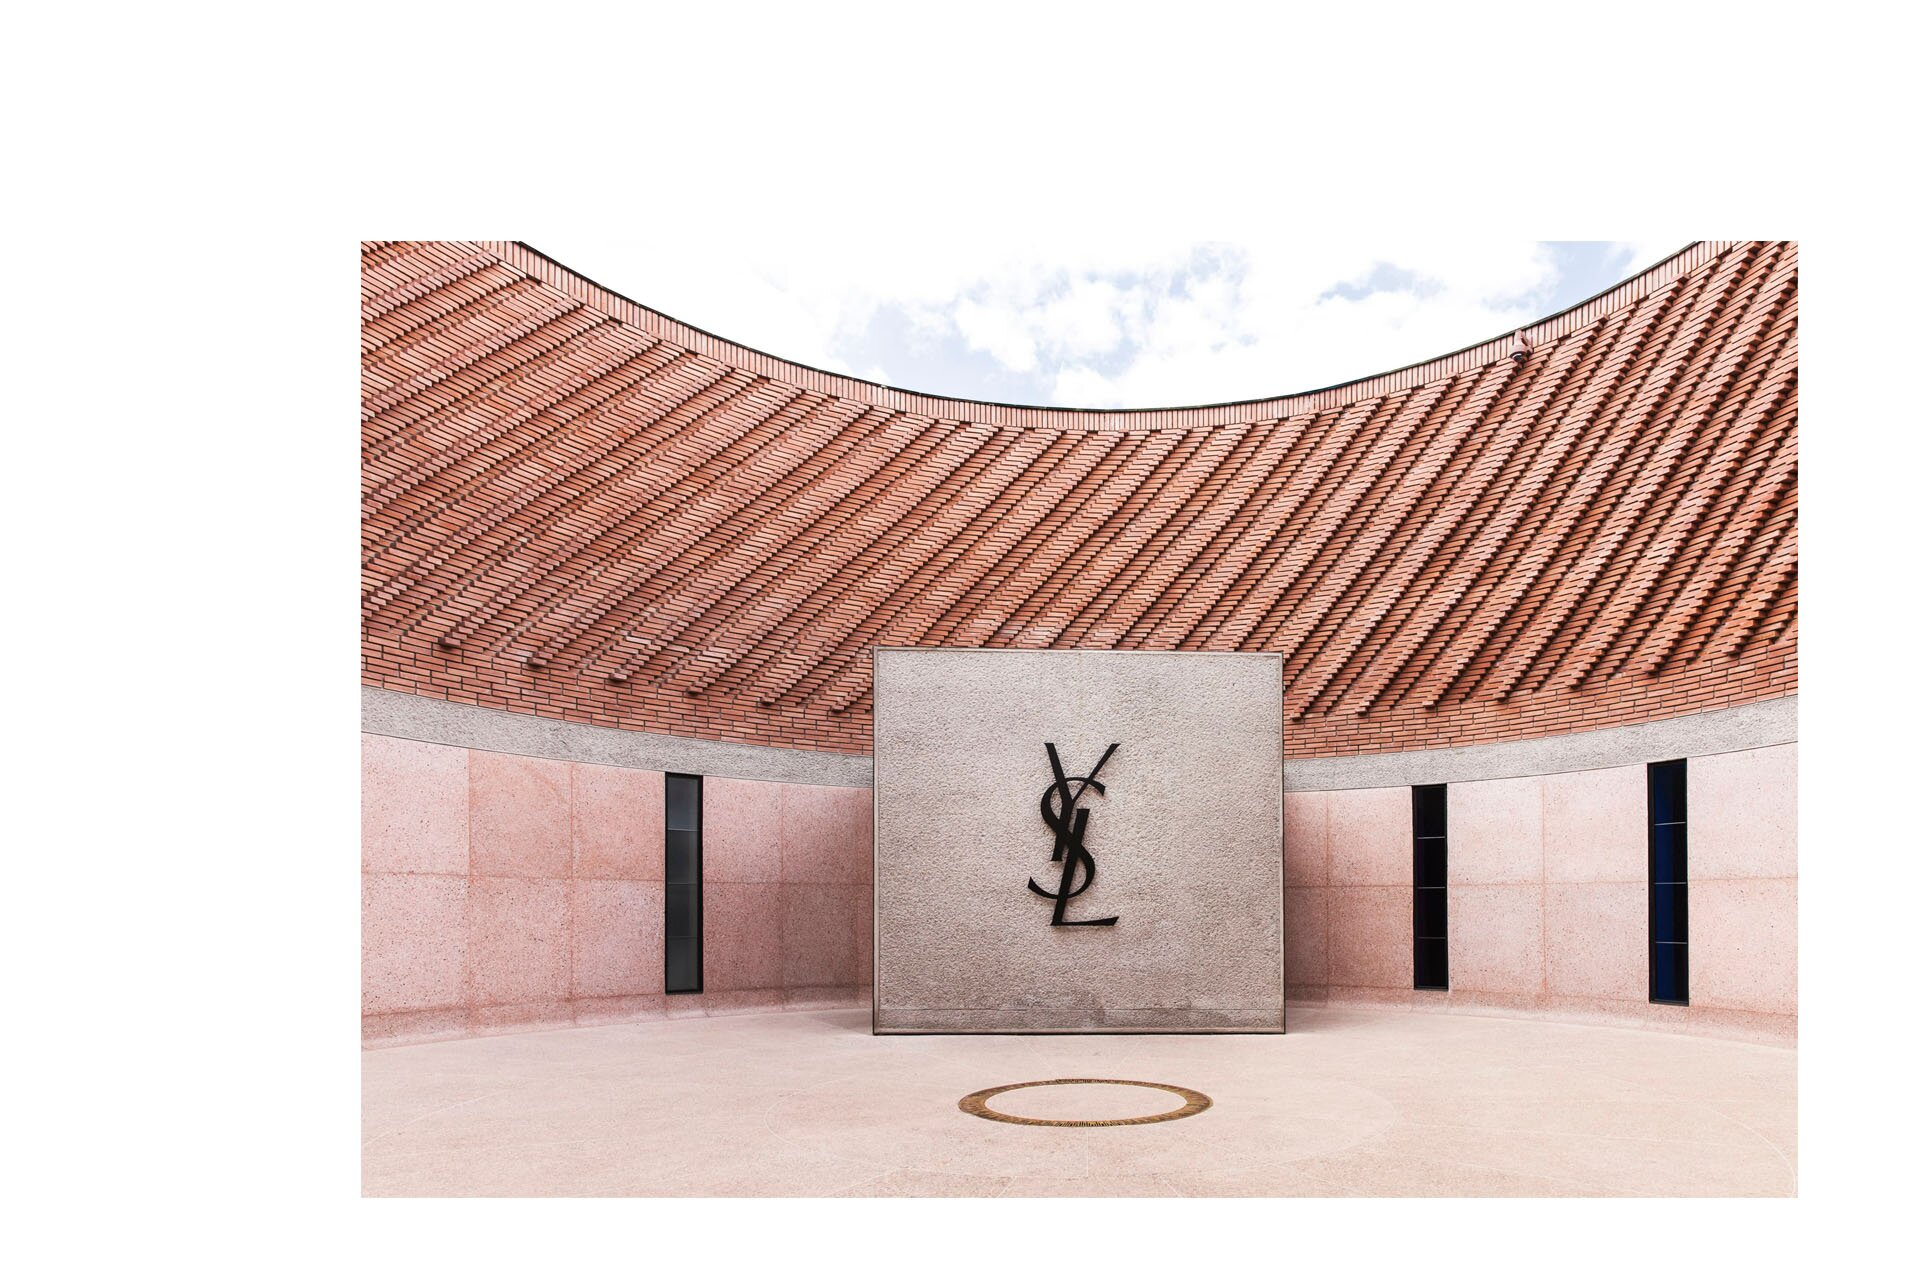 Yves Saint Laurent, Najsłynniejsi projektanci, Francuska moda, Haute Couture, Marrakesz